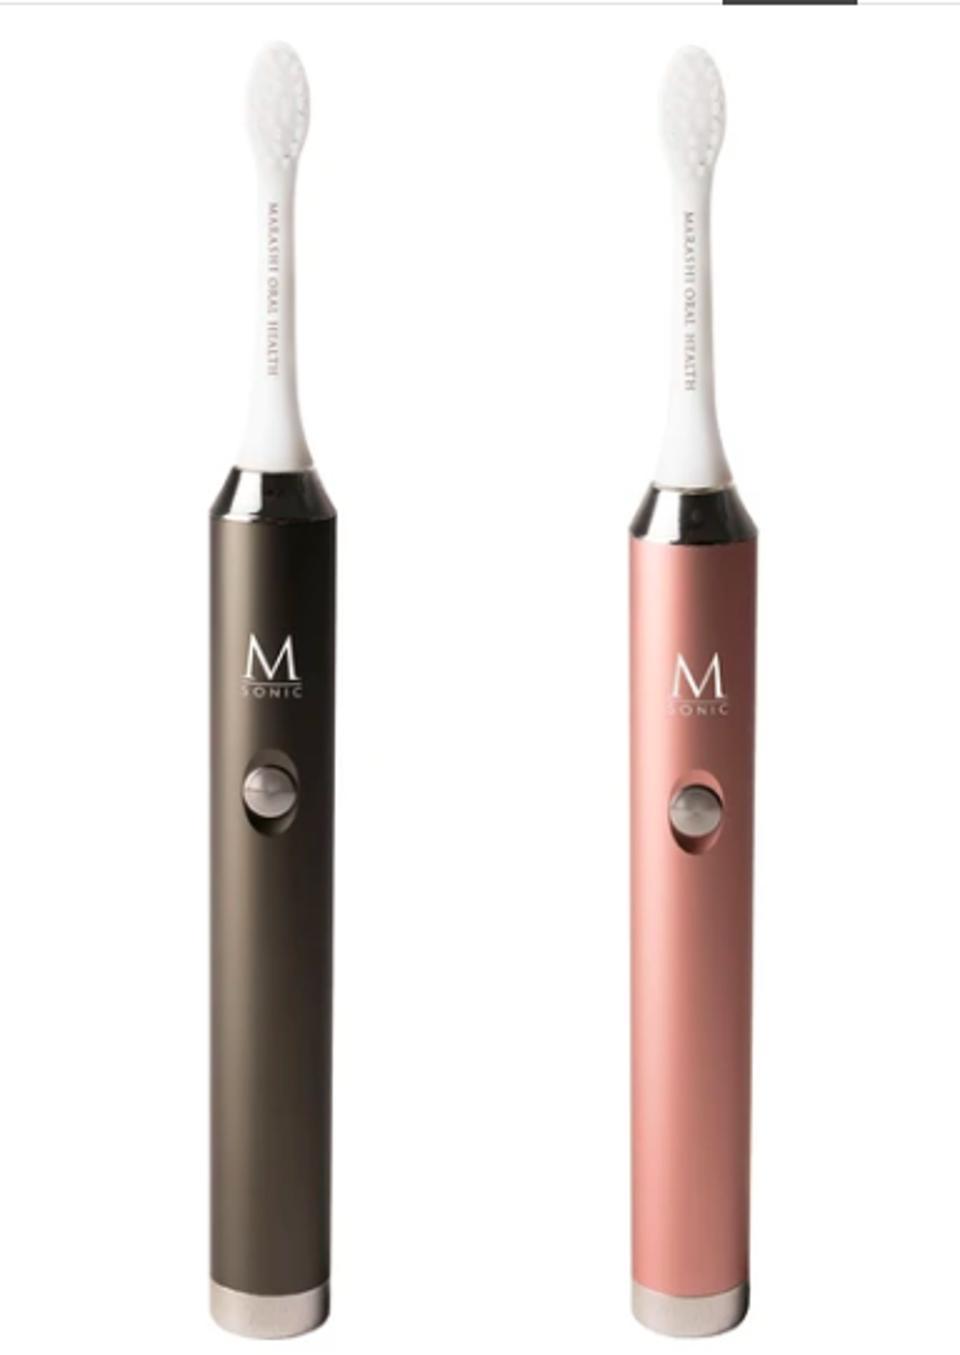 M Sonic Toothbrush by DR MARASHI